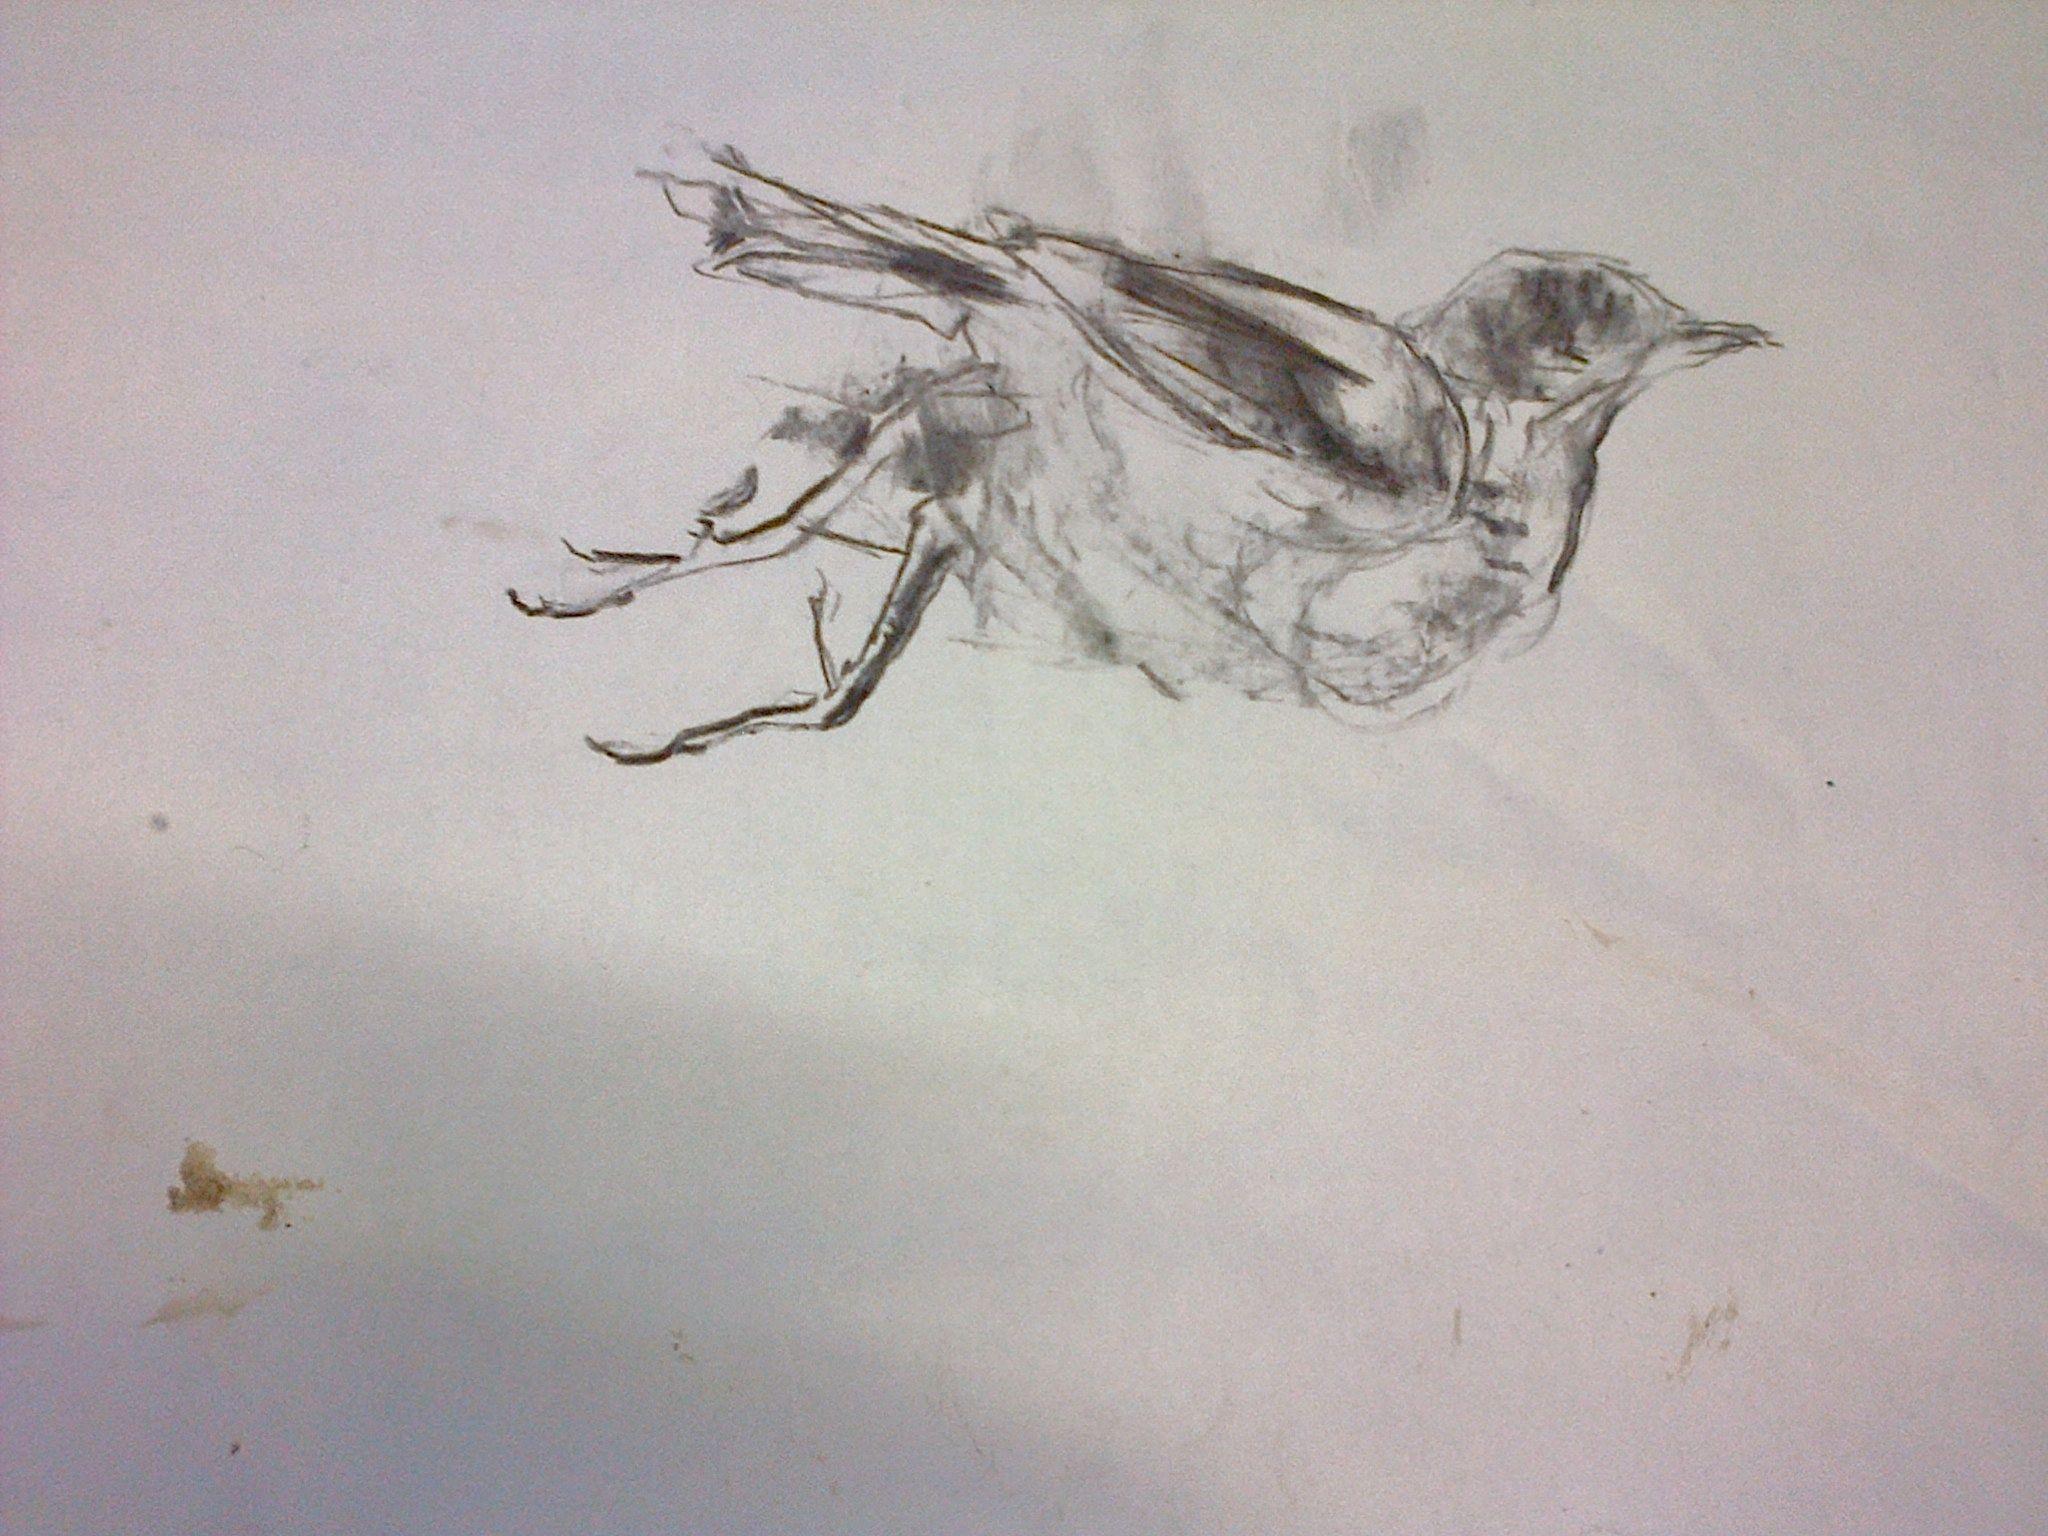 Fallen Bird .Sketch May 2015. Pascale Chandler